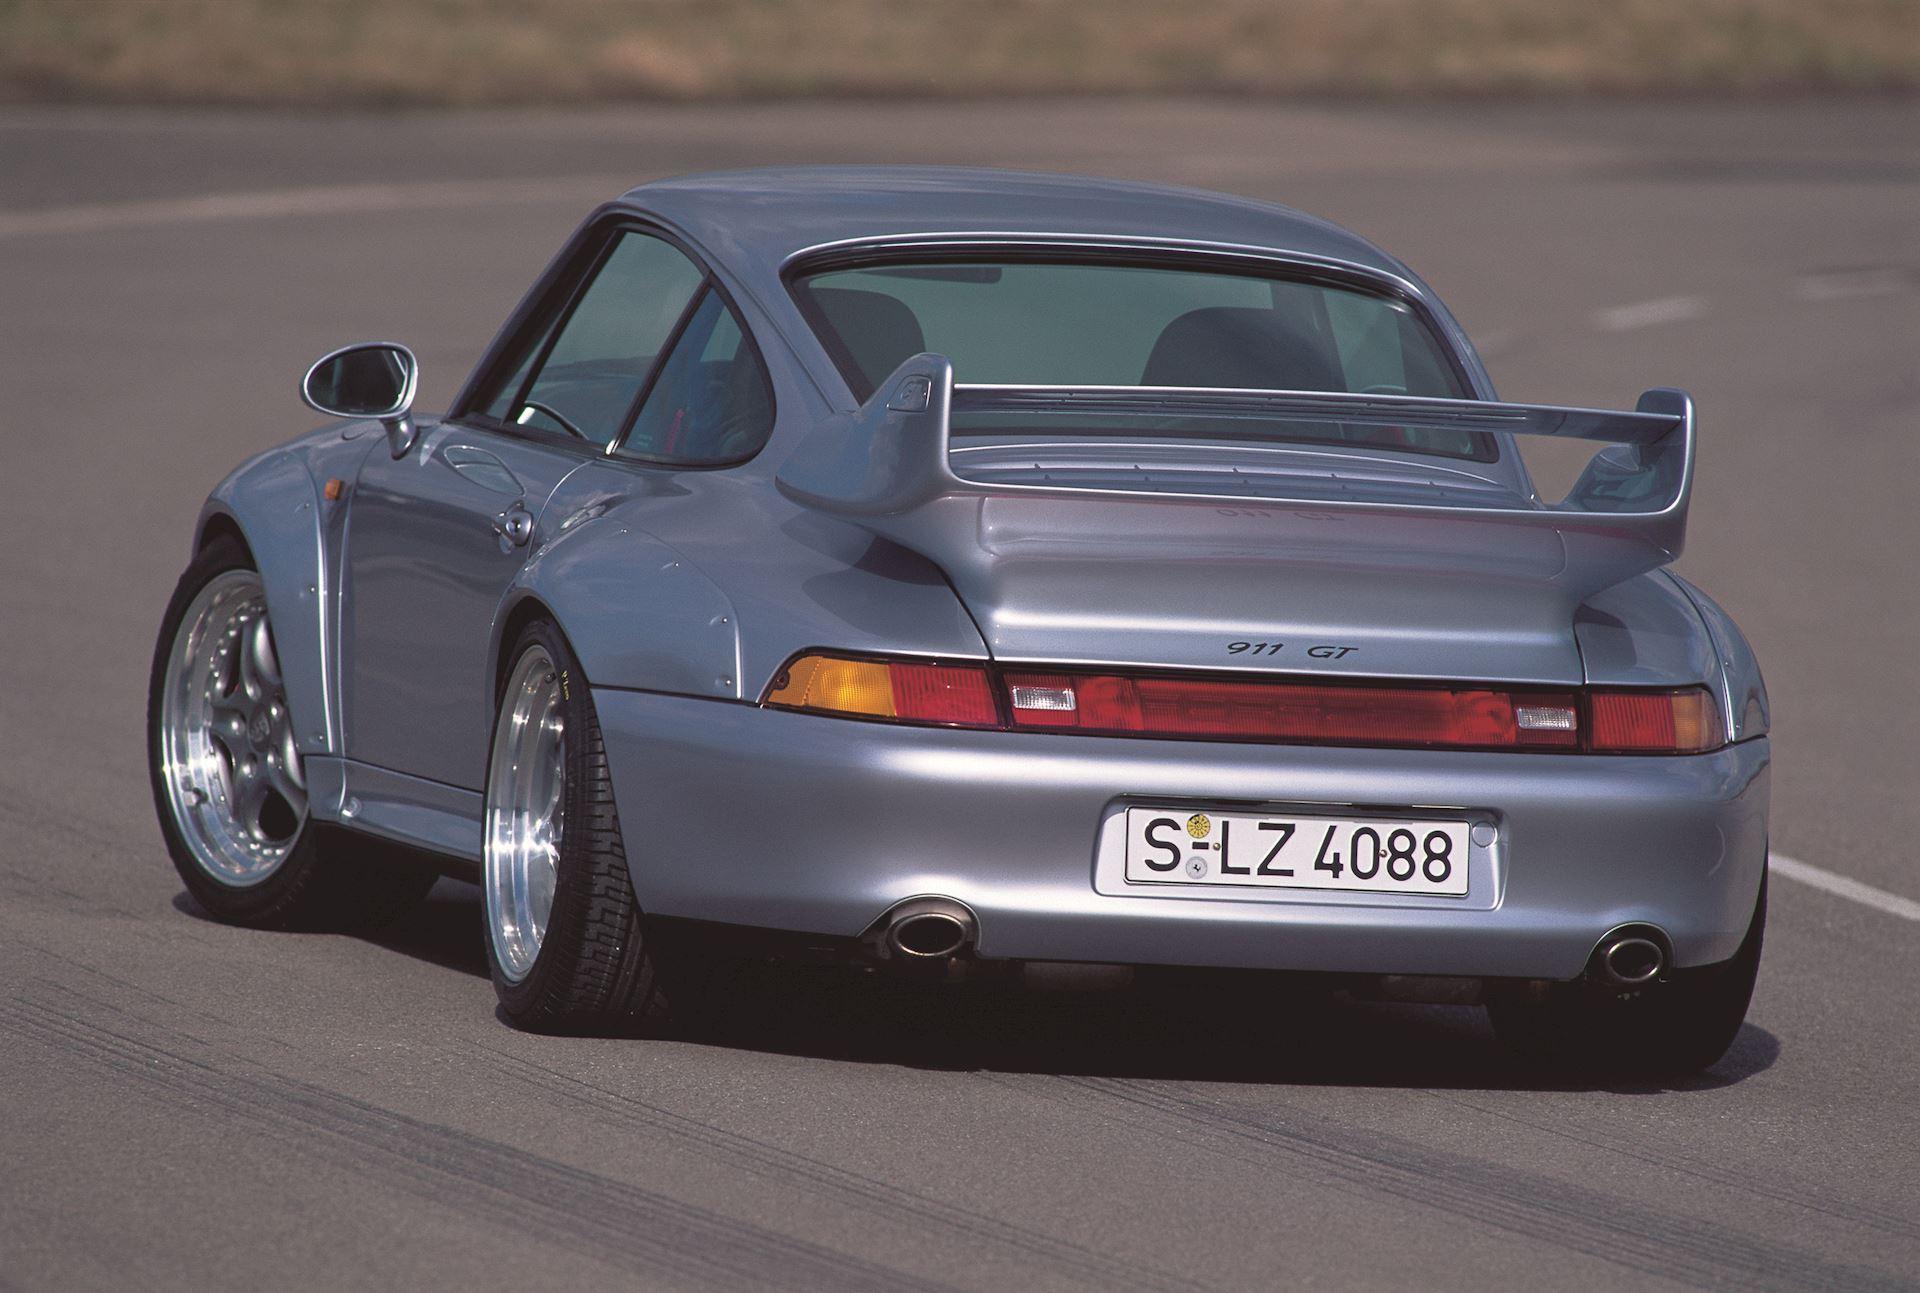 The Most Iconic Classic Cars | DM Historics